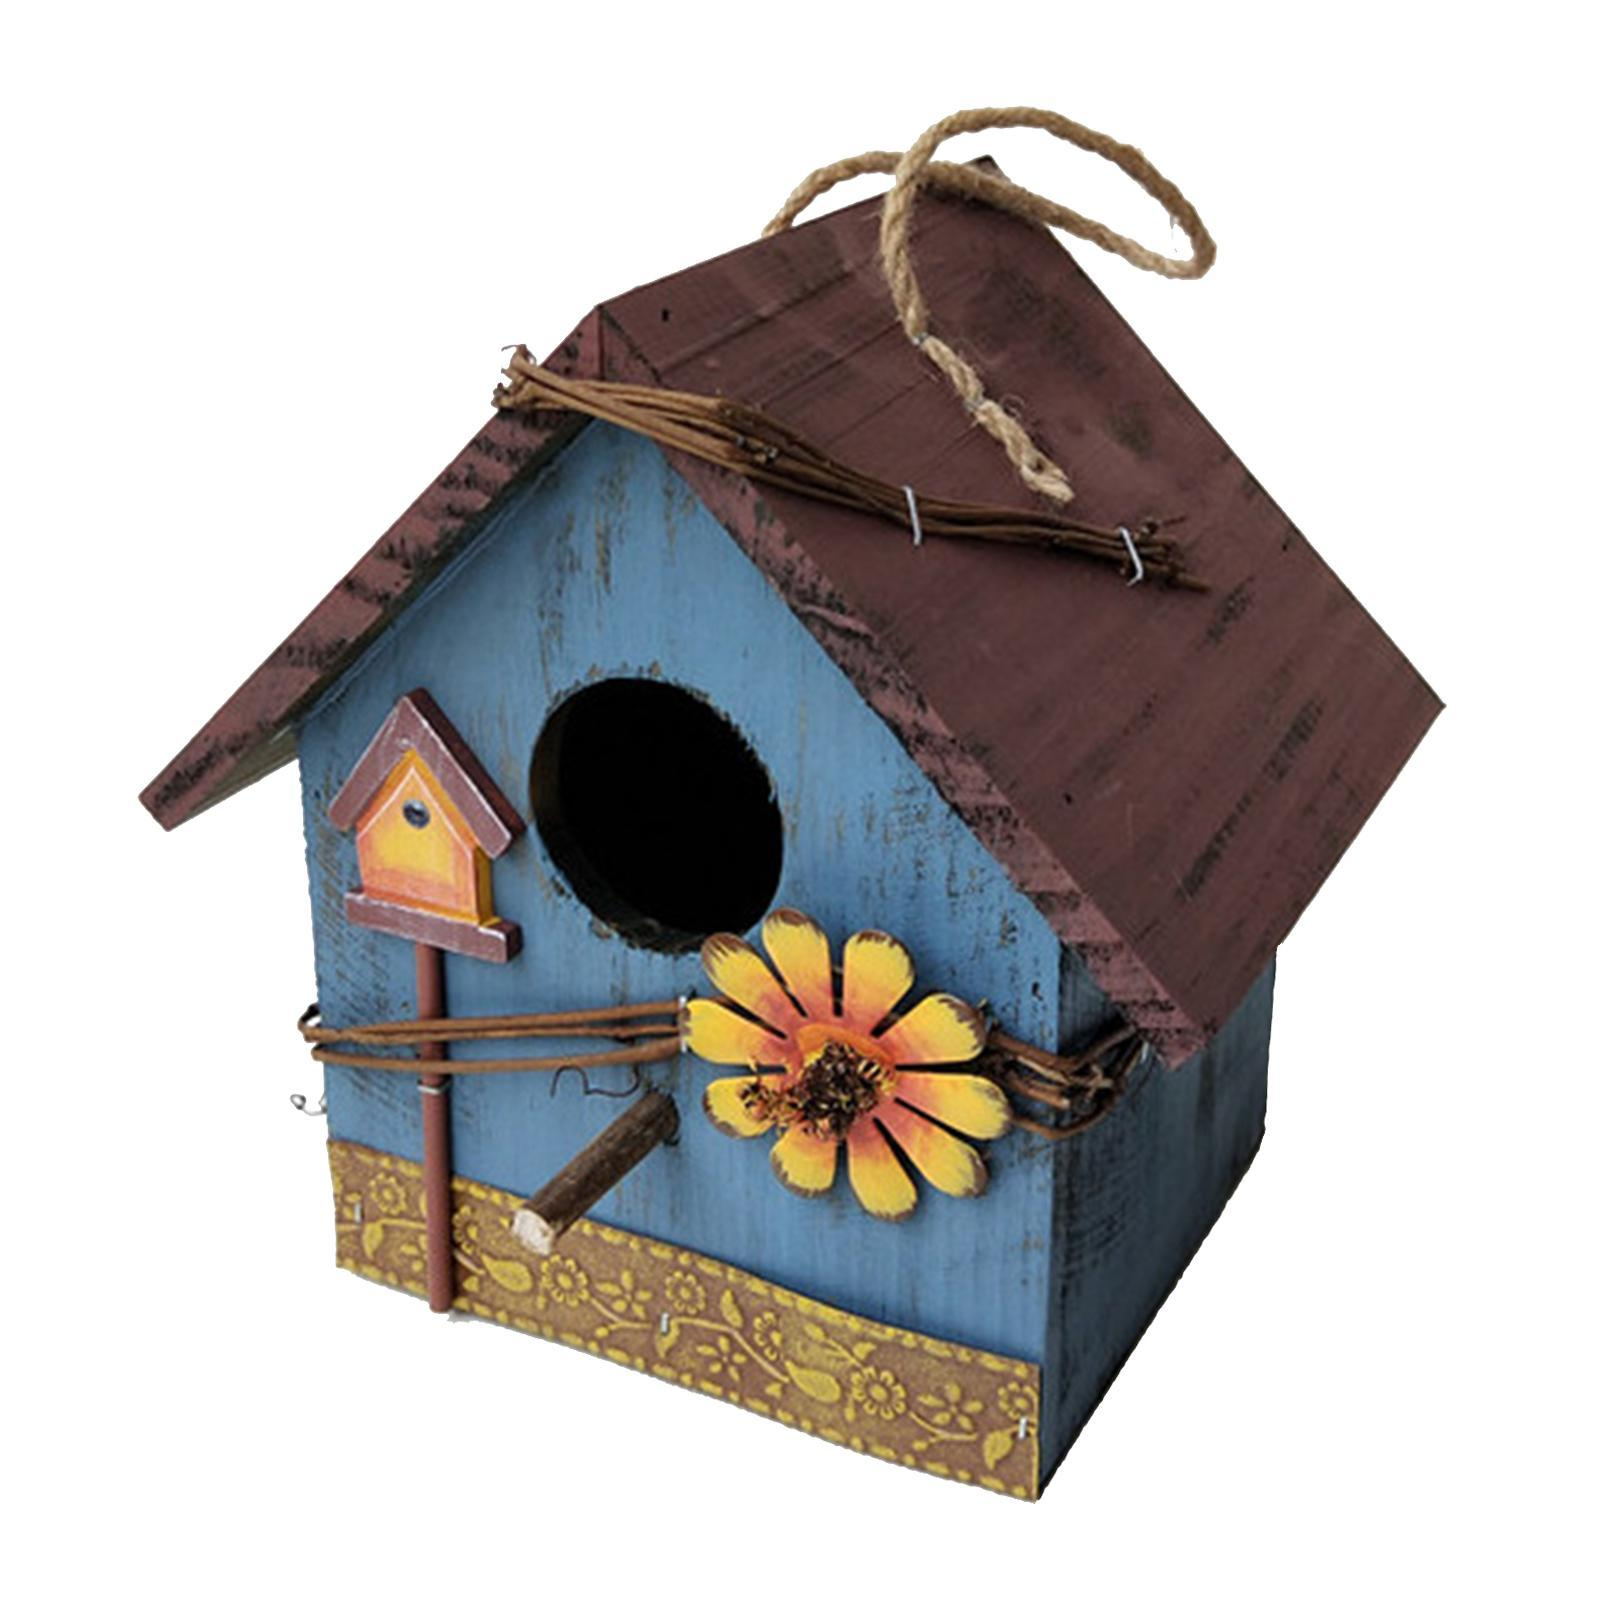 thumbnail 22 - Antique Hand Painted Wood Birdhouse Decorative Outdoor Bird House Garden